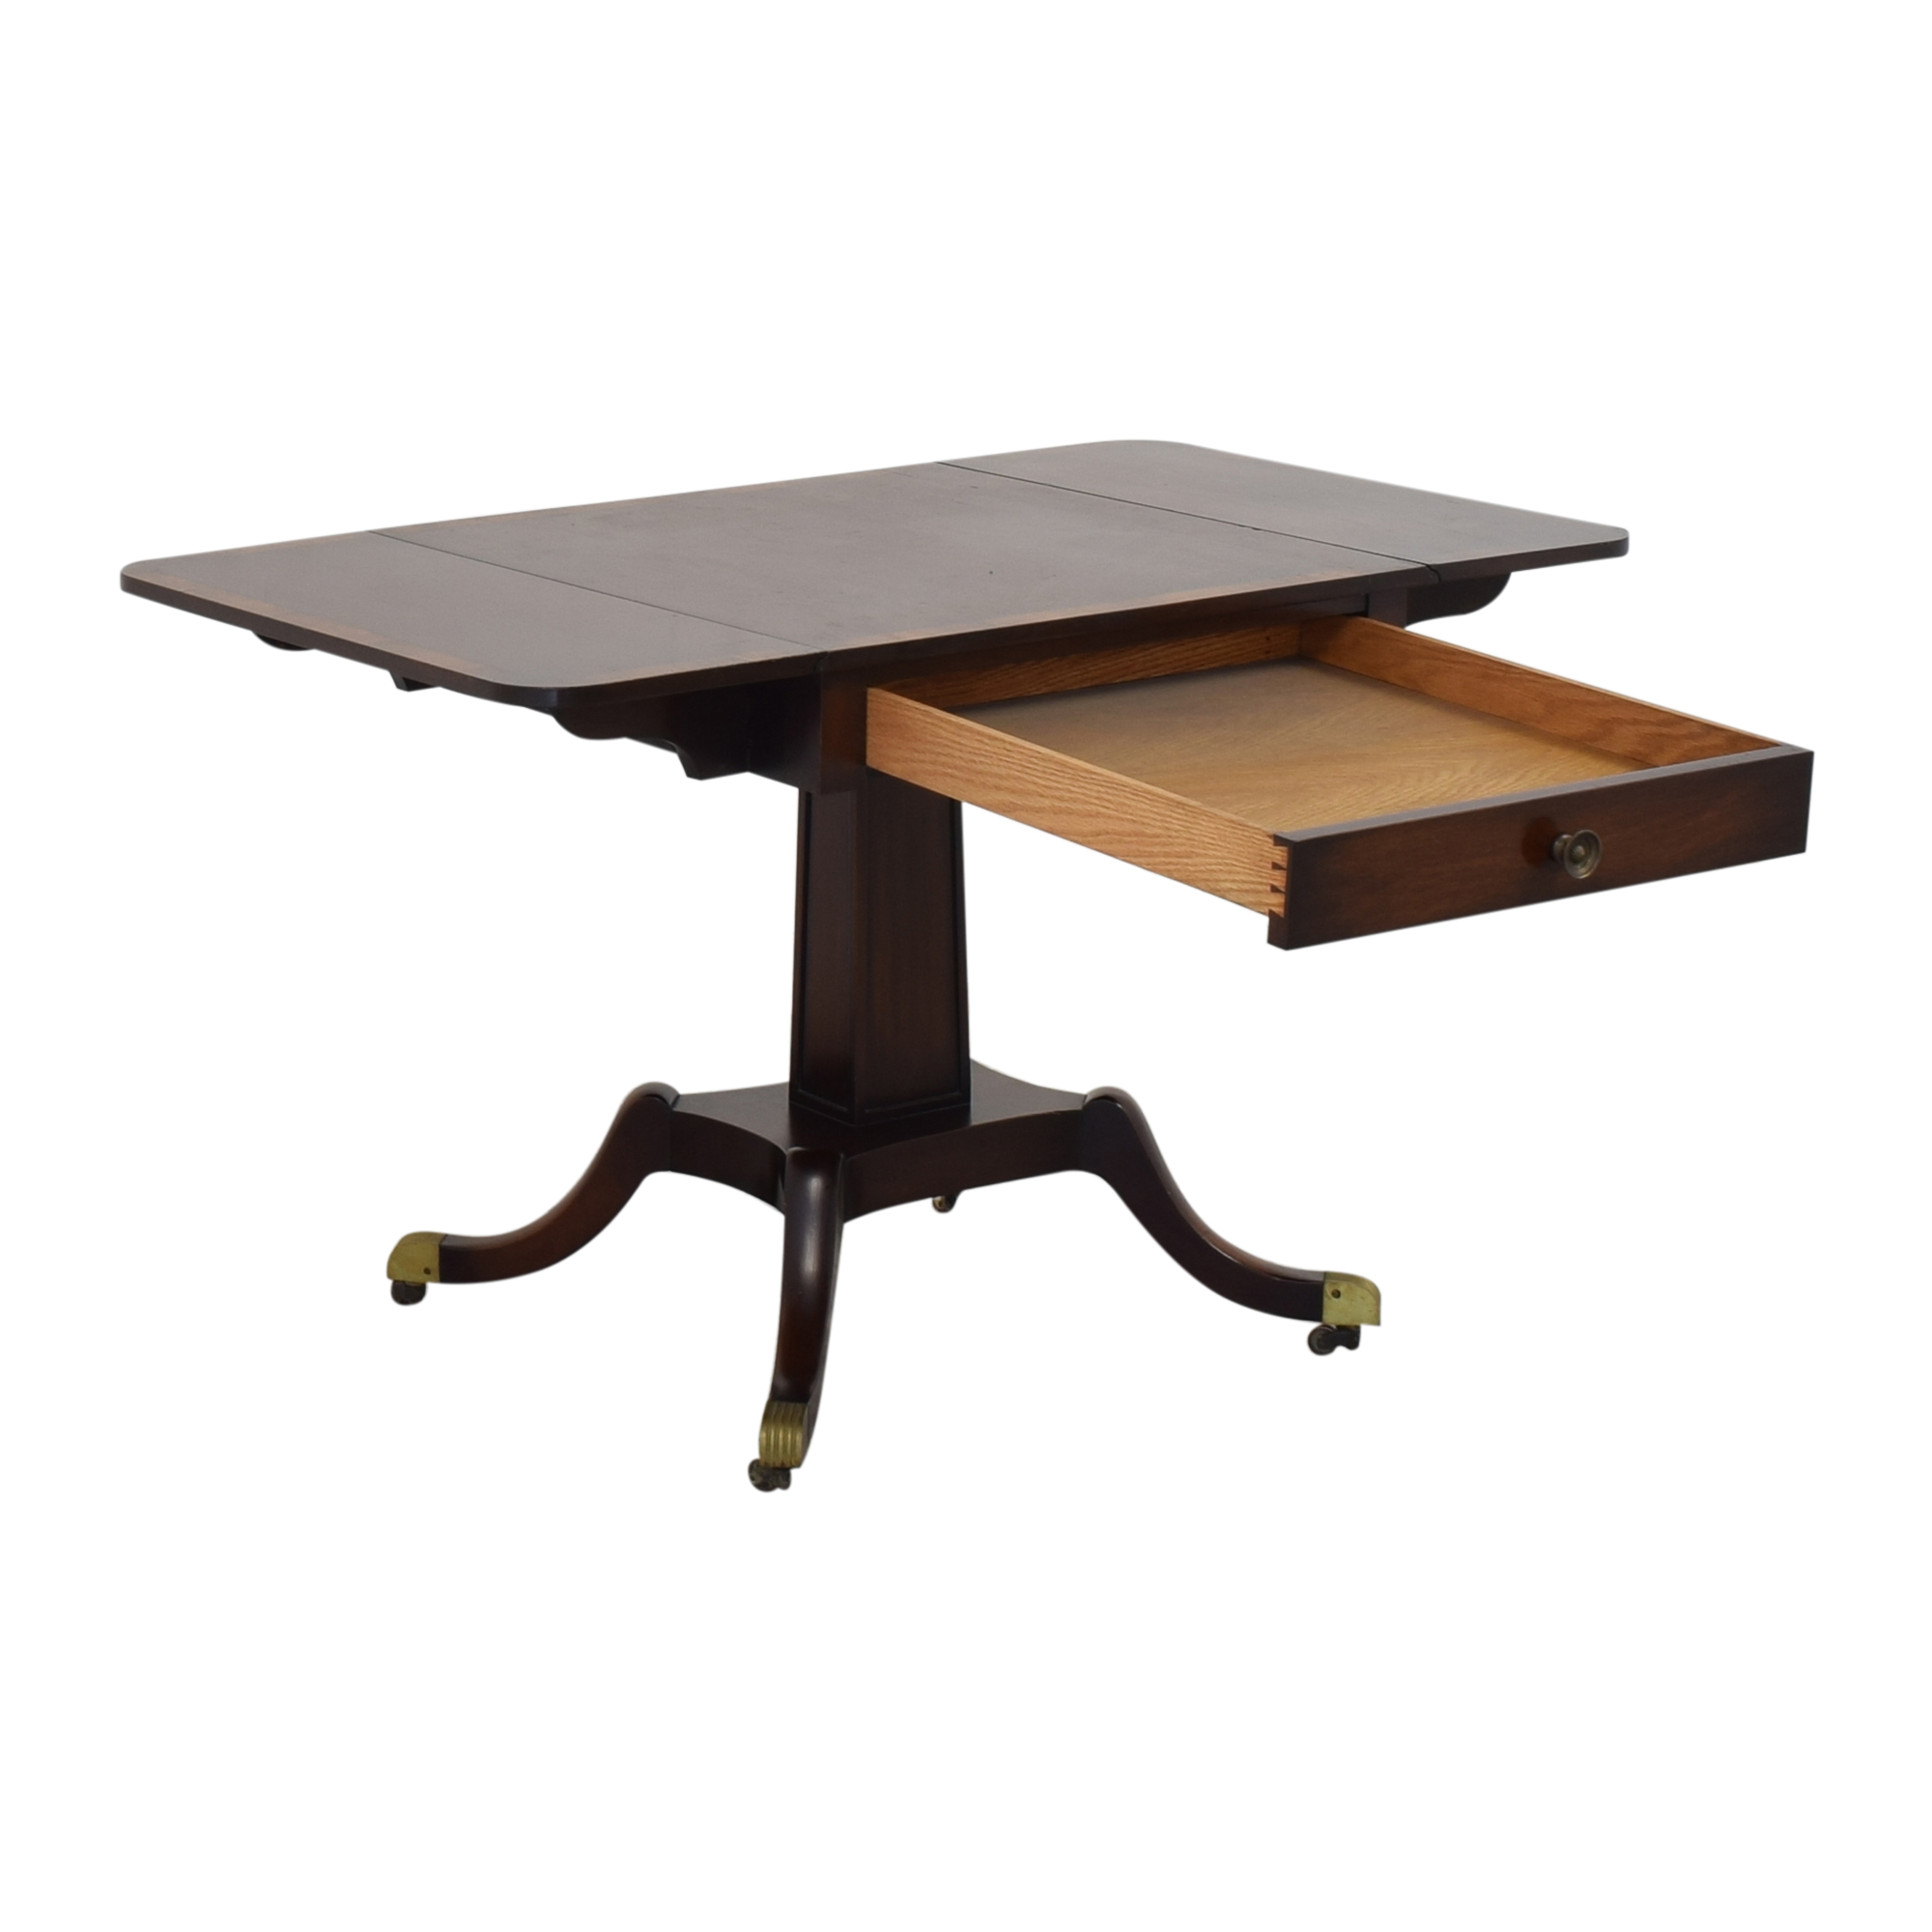 Vintage Federal Style Drop Leaf Table dimensions